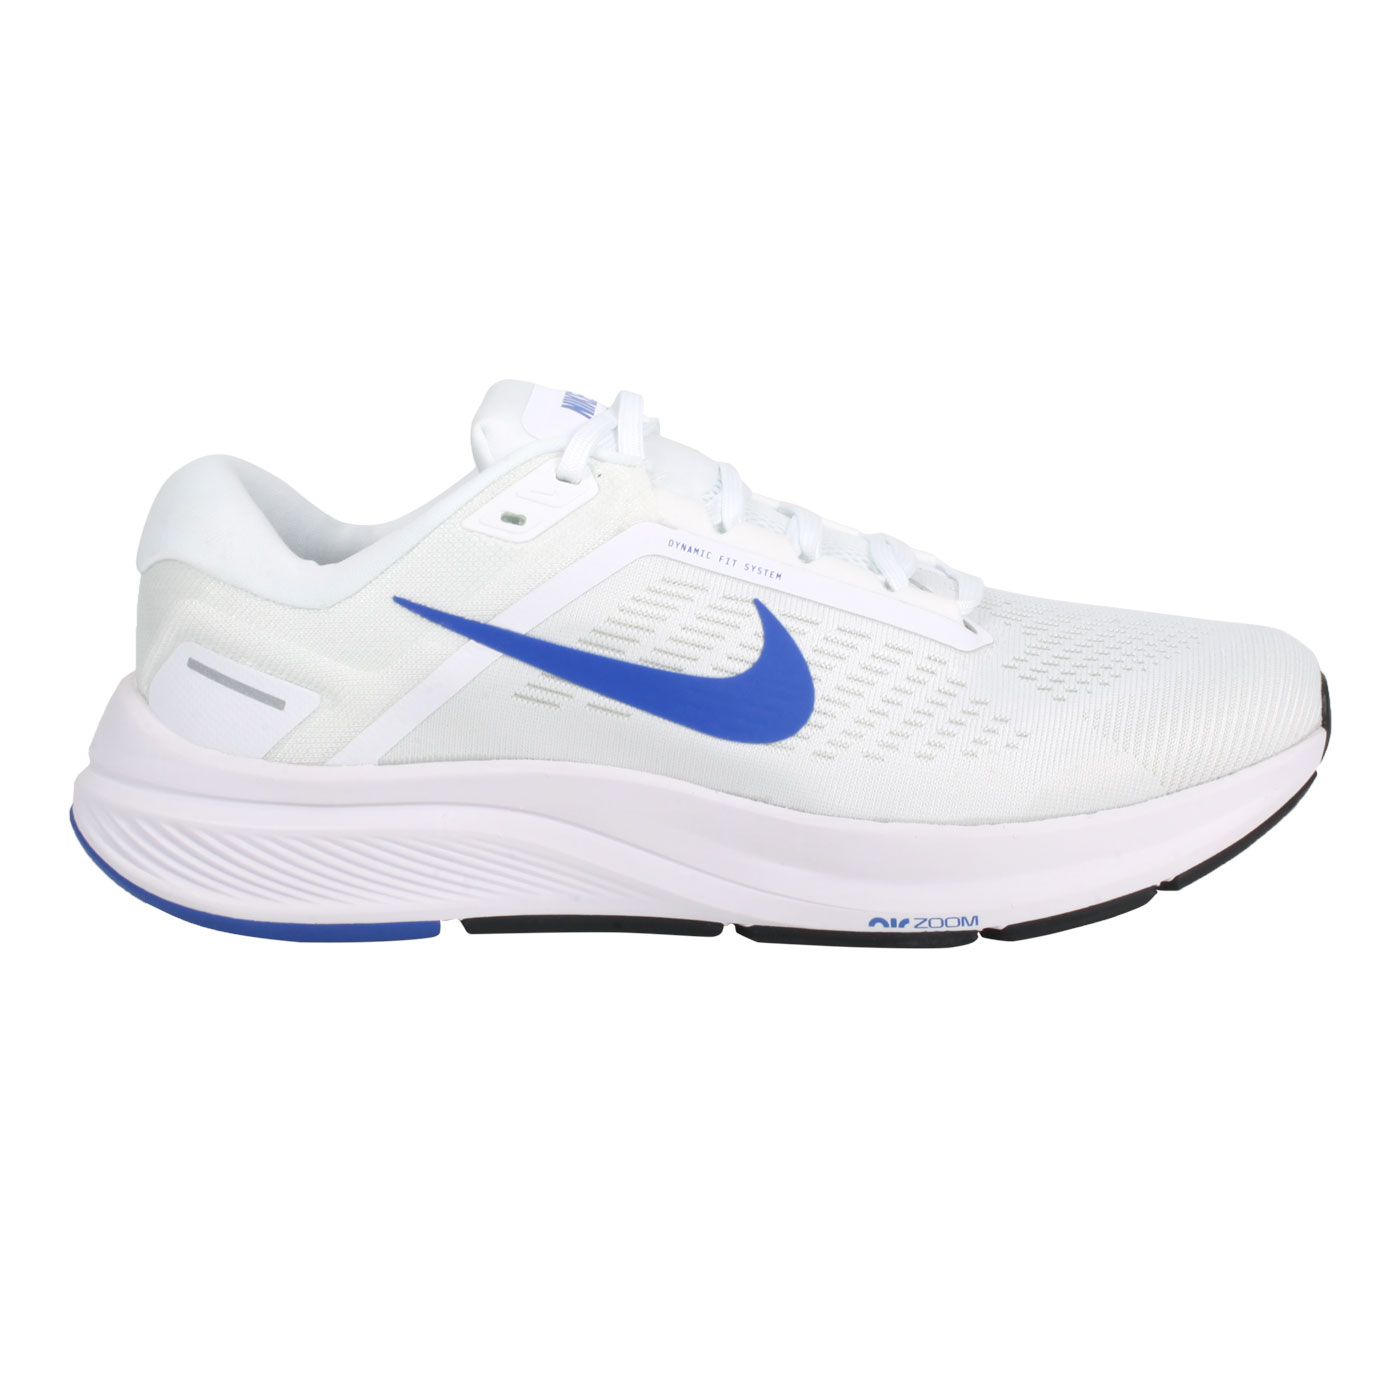 NIKE 男款休閒慢跑鞋  @AIR ZOOM STRUCTURE 24@DA8535-100